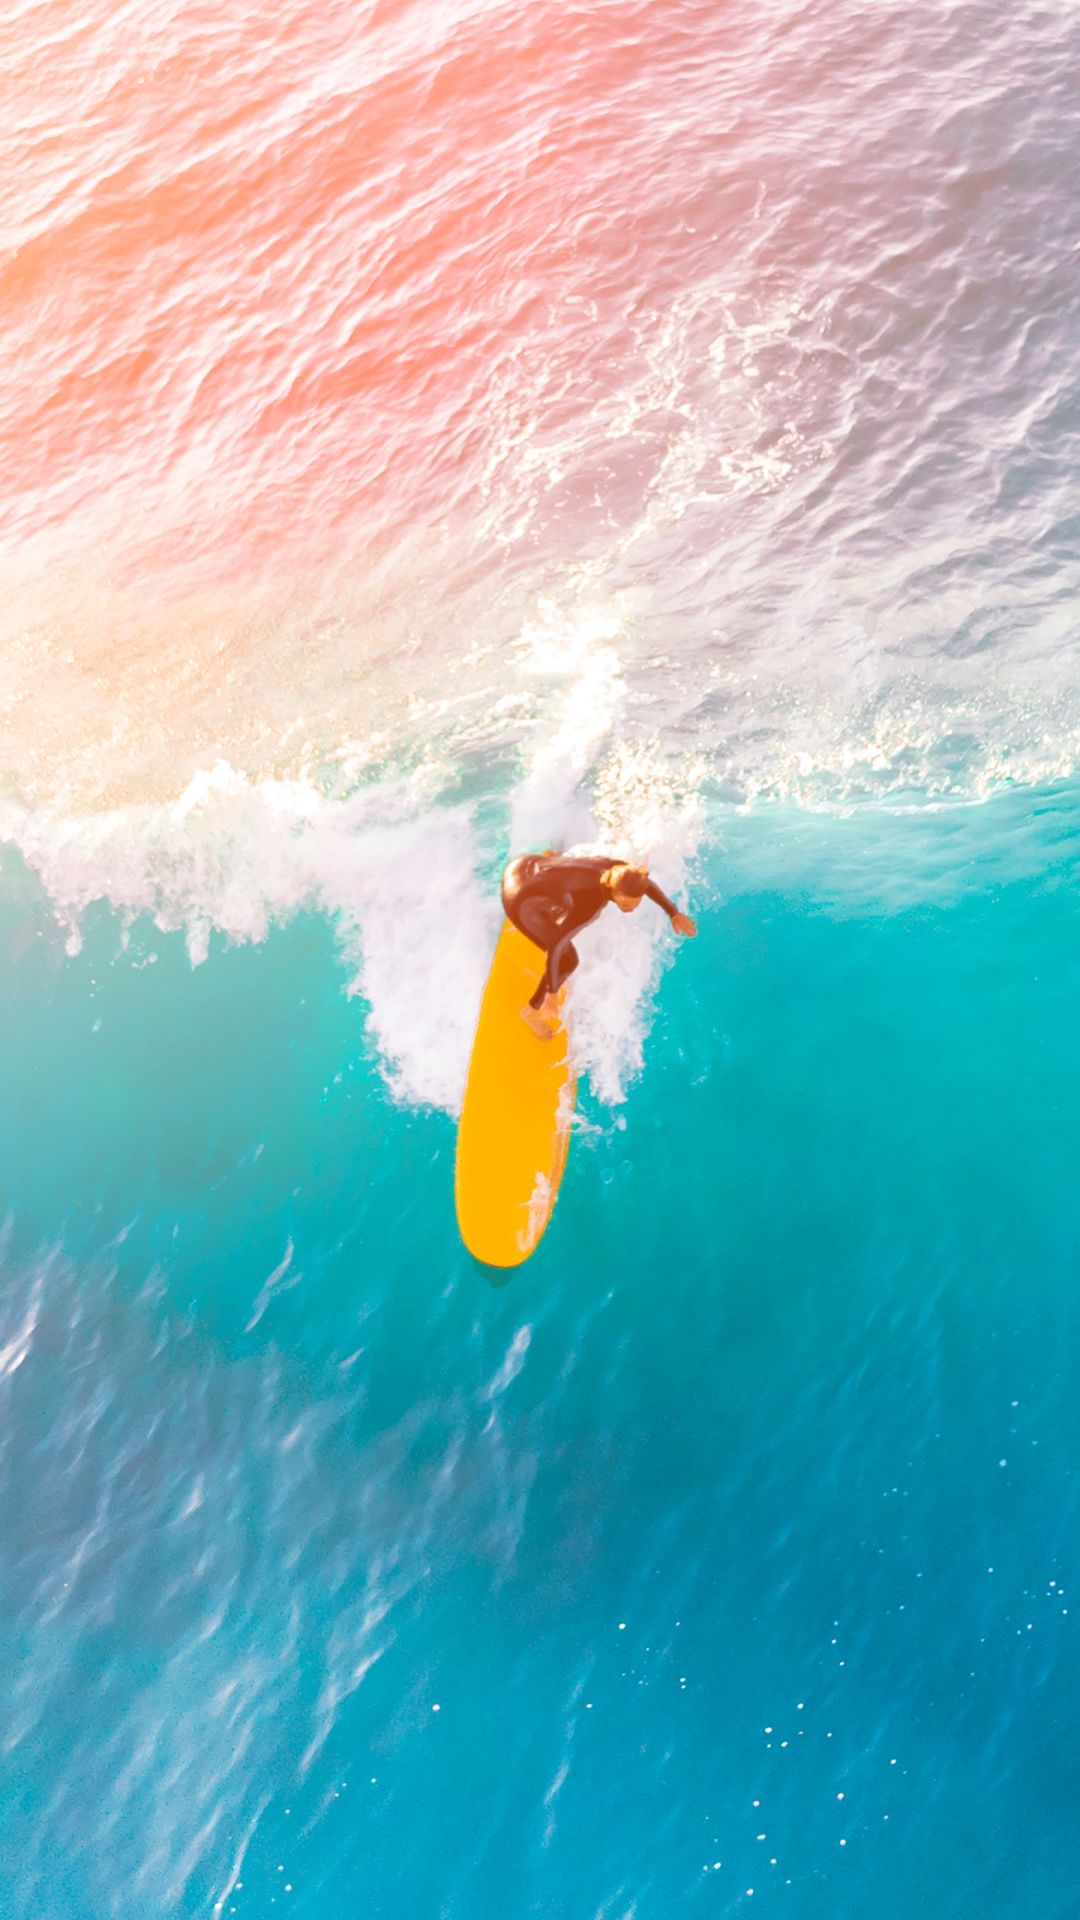 Surf wallpaper Surf painting, Surfing wallpaper